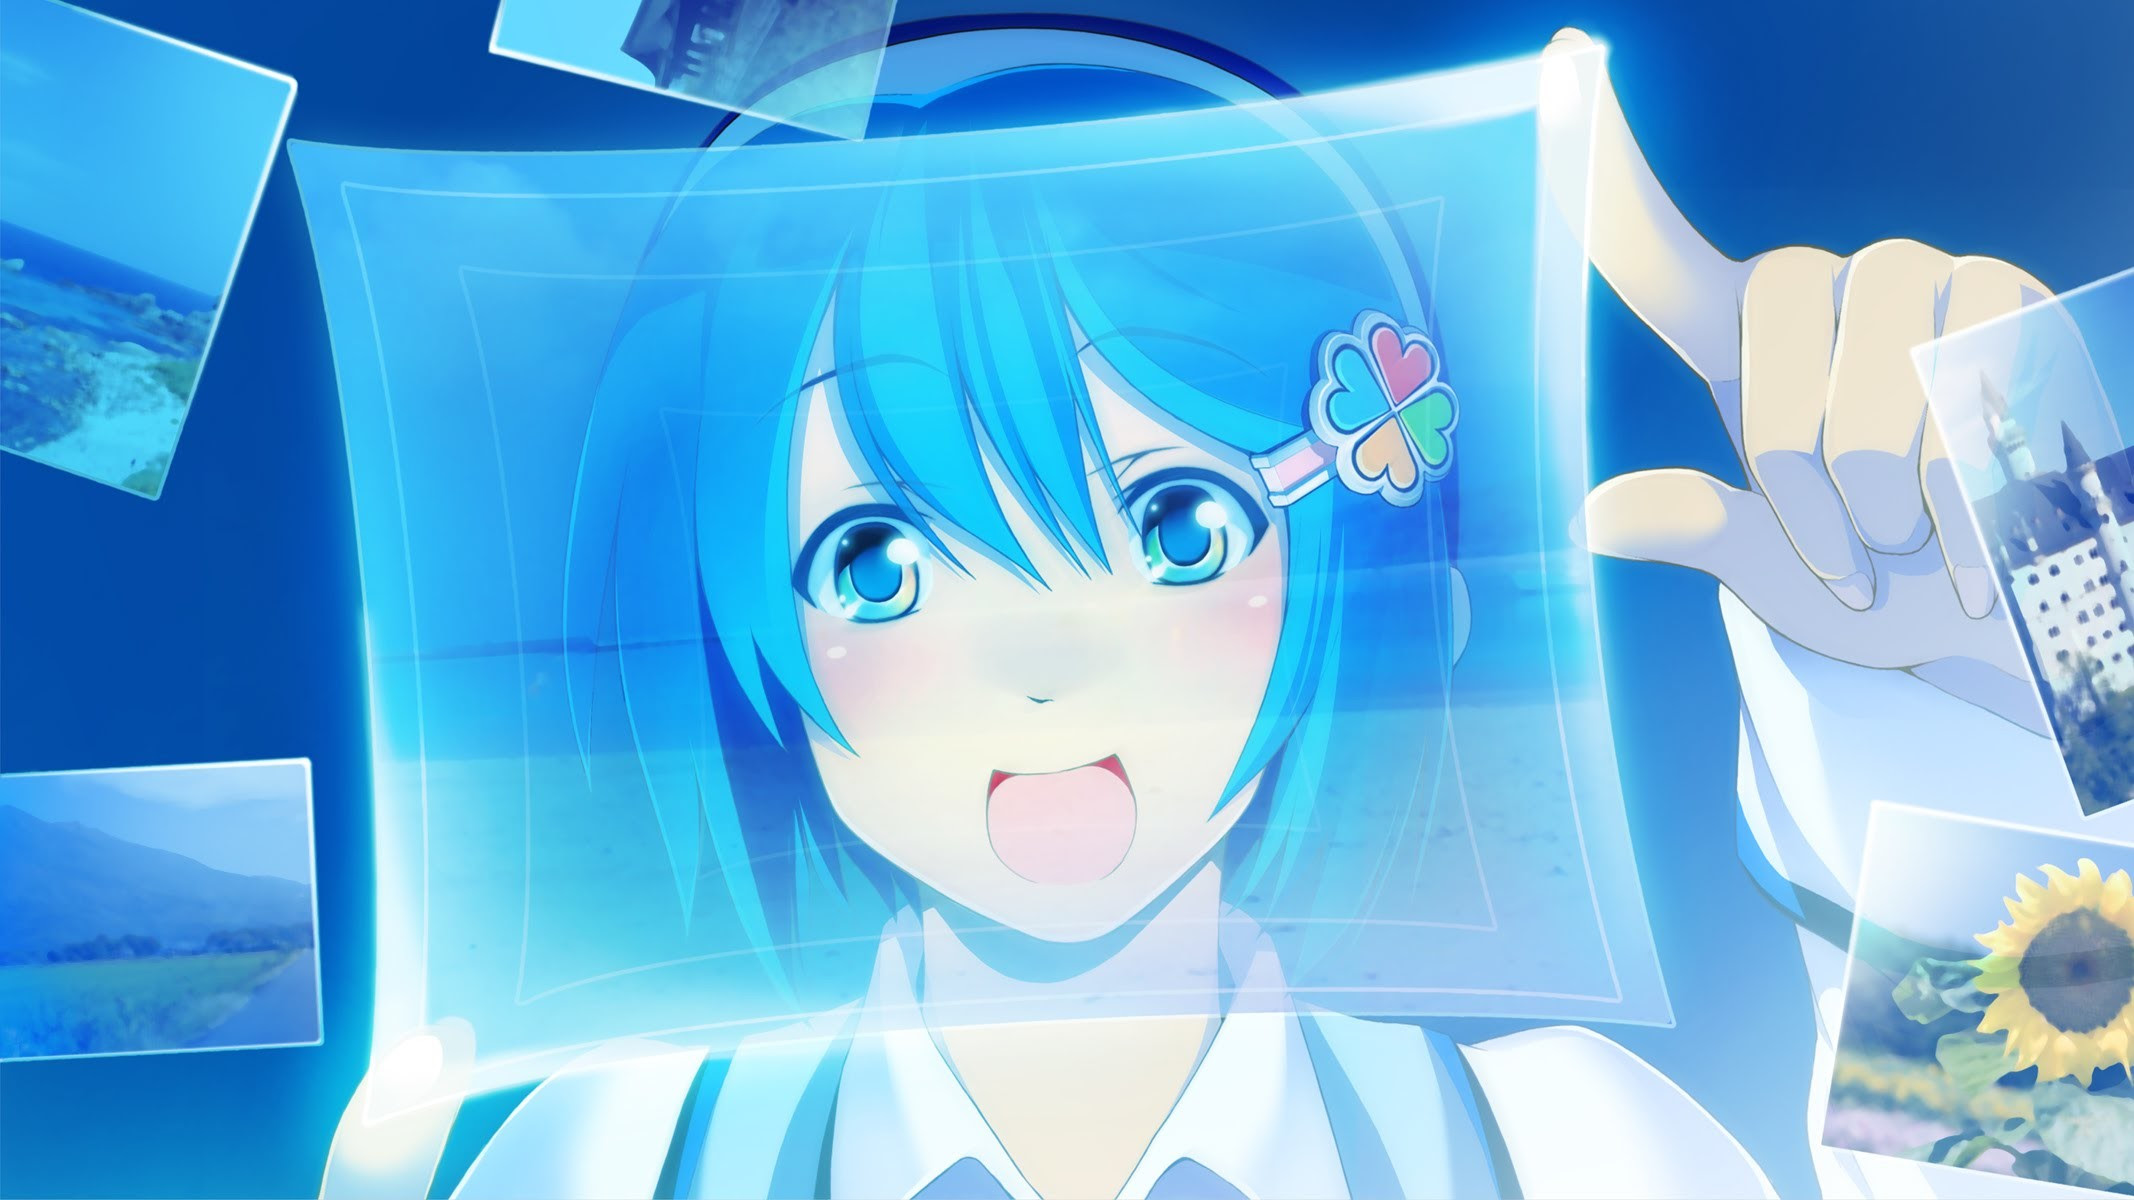 Unduh 5000 Wallpaper Anime Keren Windows 7  Paling Keren